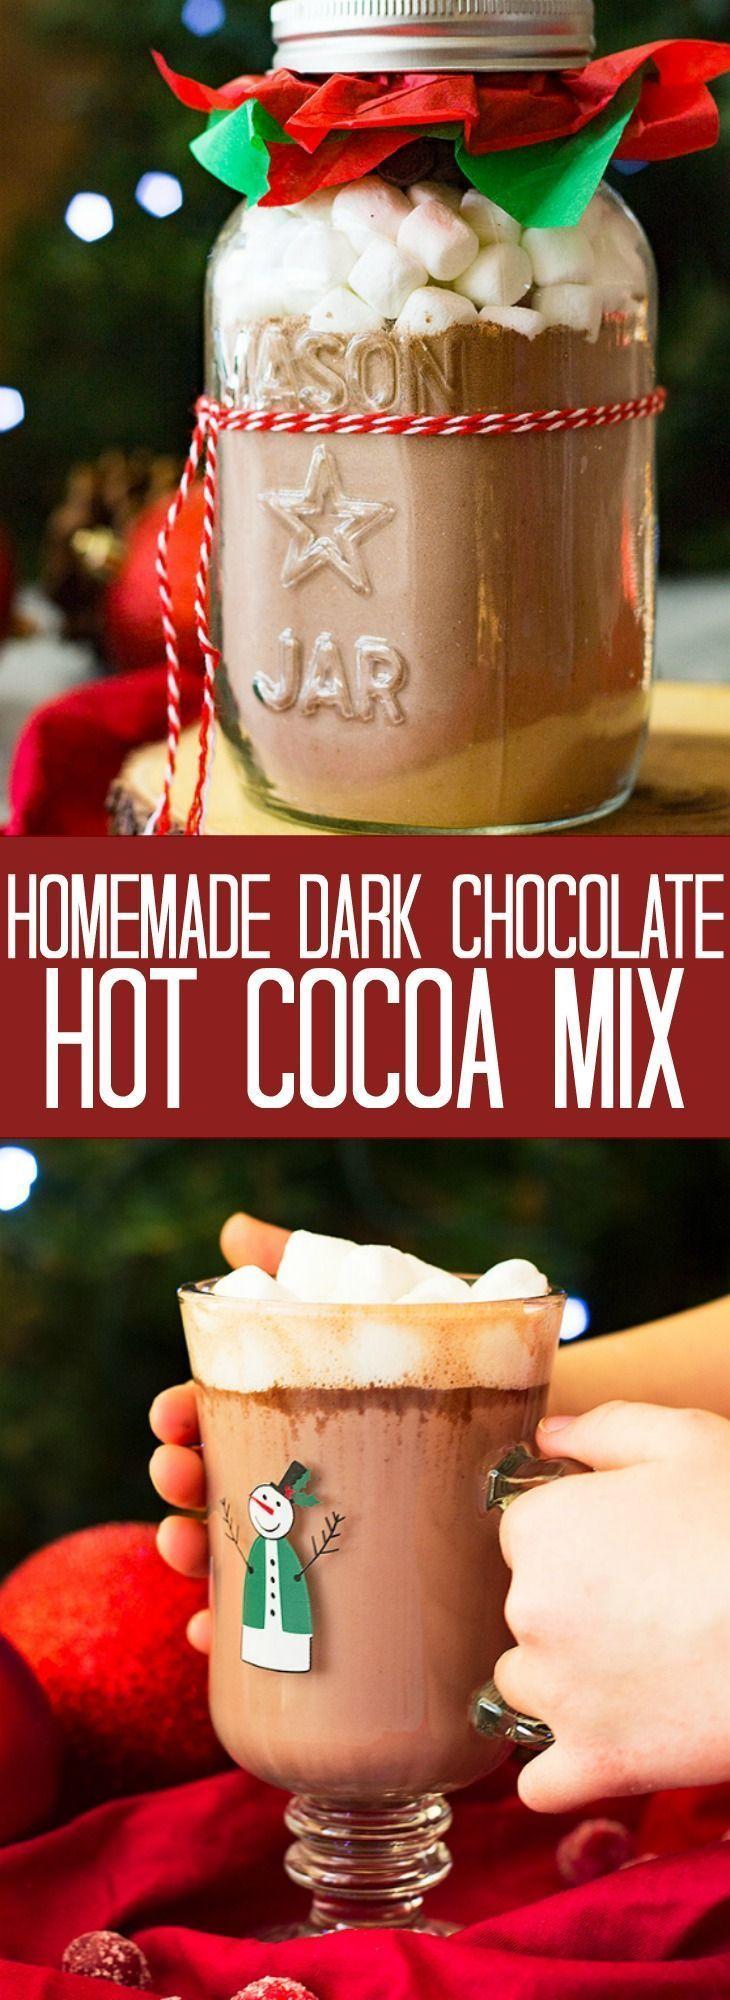 Homemade Dark Chocolate Hot Cocoa Mix | Countryside Cravings